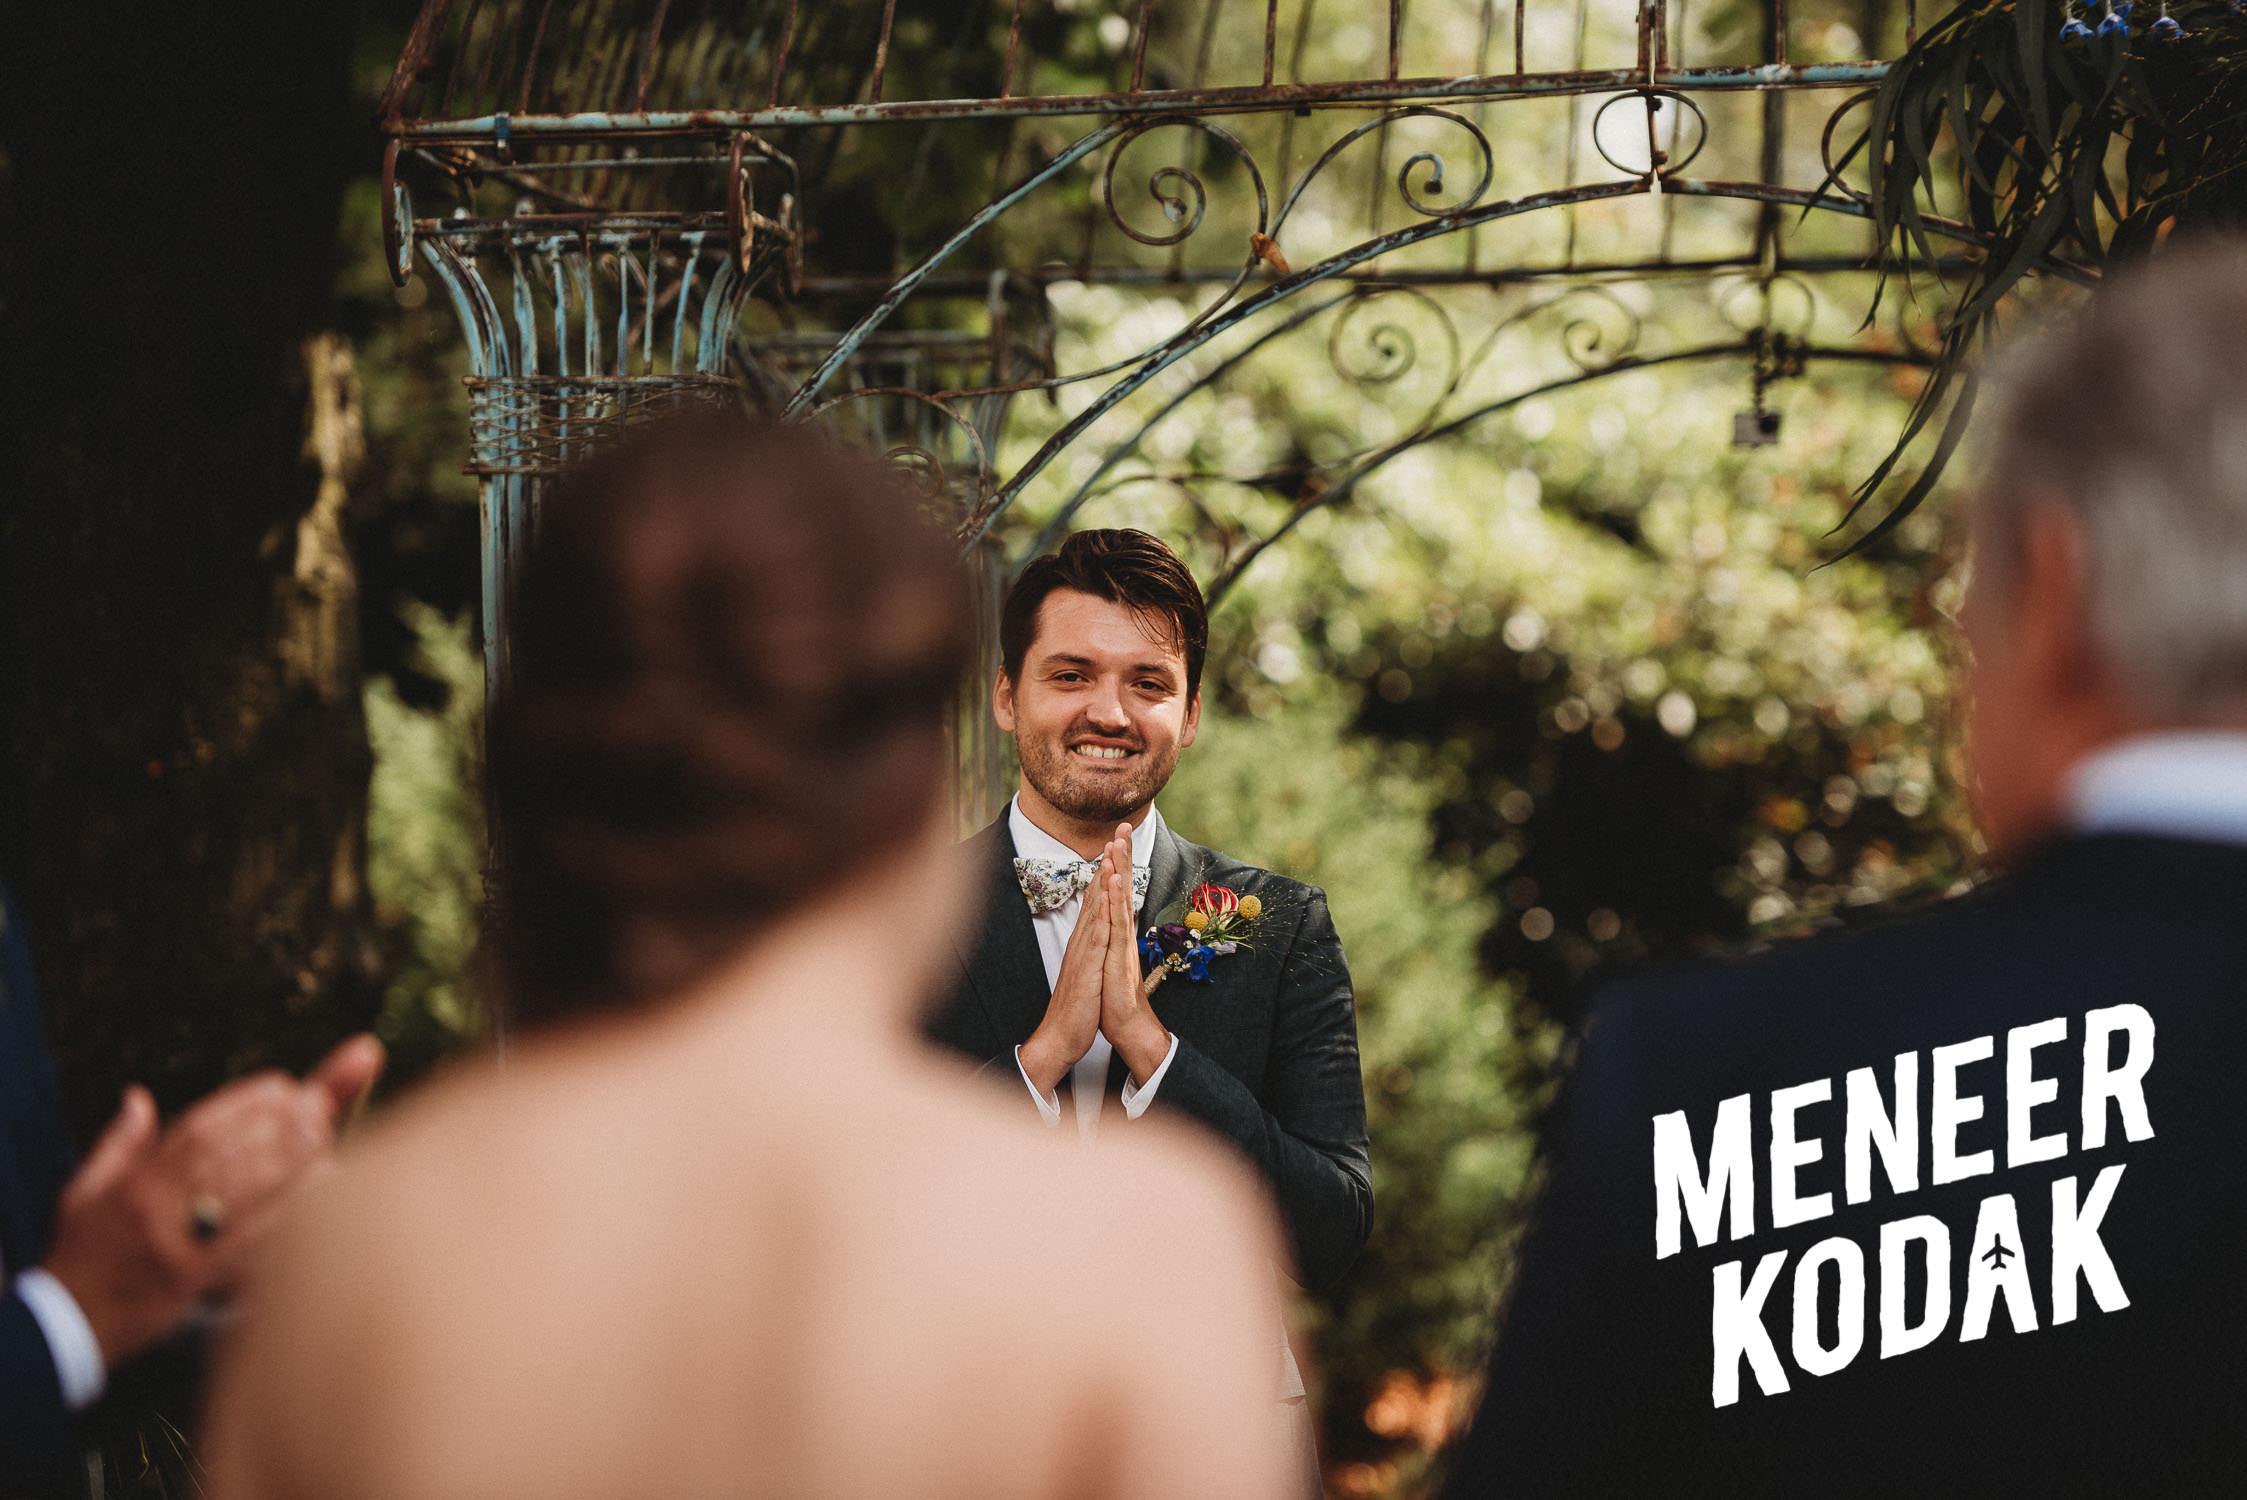 Meneer Kodak - Trouwreportage - Breda - E&M-095.jpg